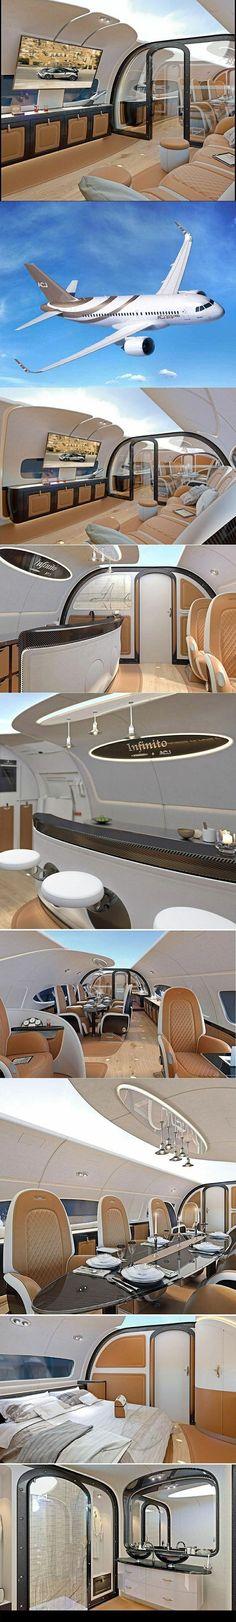 Private Jet ✈️ Interior Panoramic Tour #luxuryprivatejets